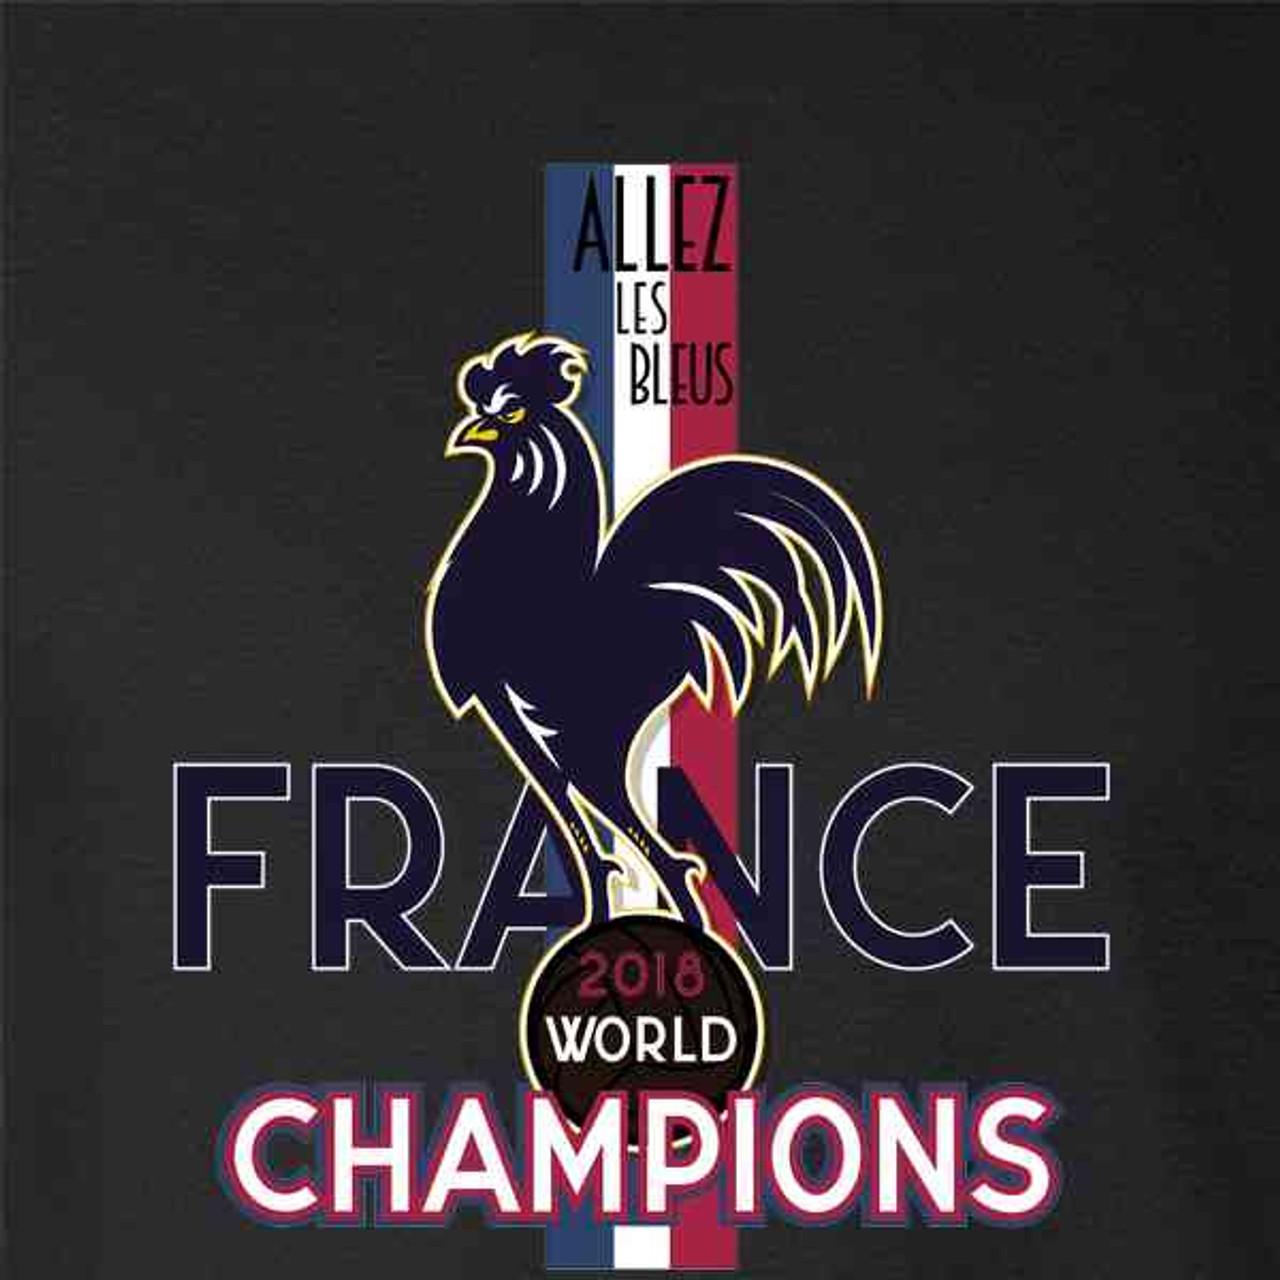 c99e690eb391 France Soccer 2018 World Champions Football - Pop Threads